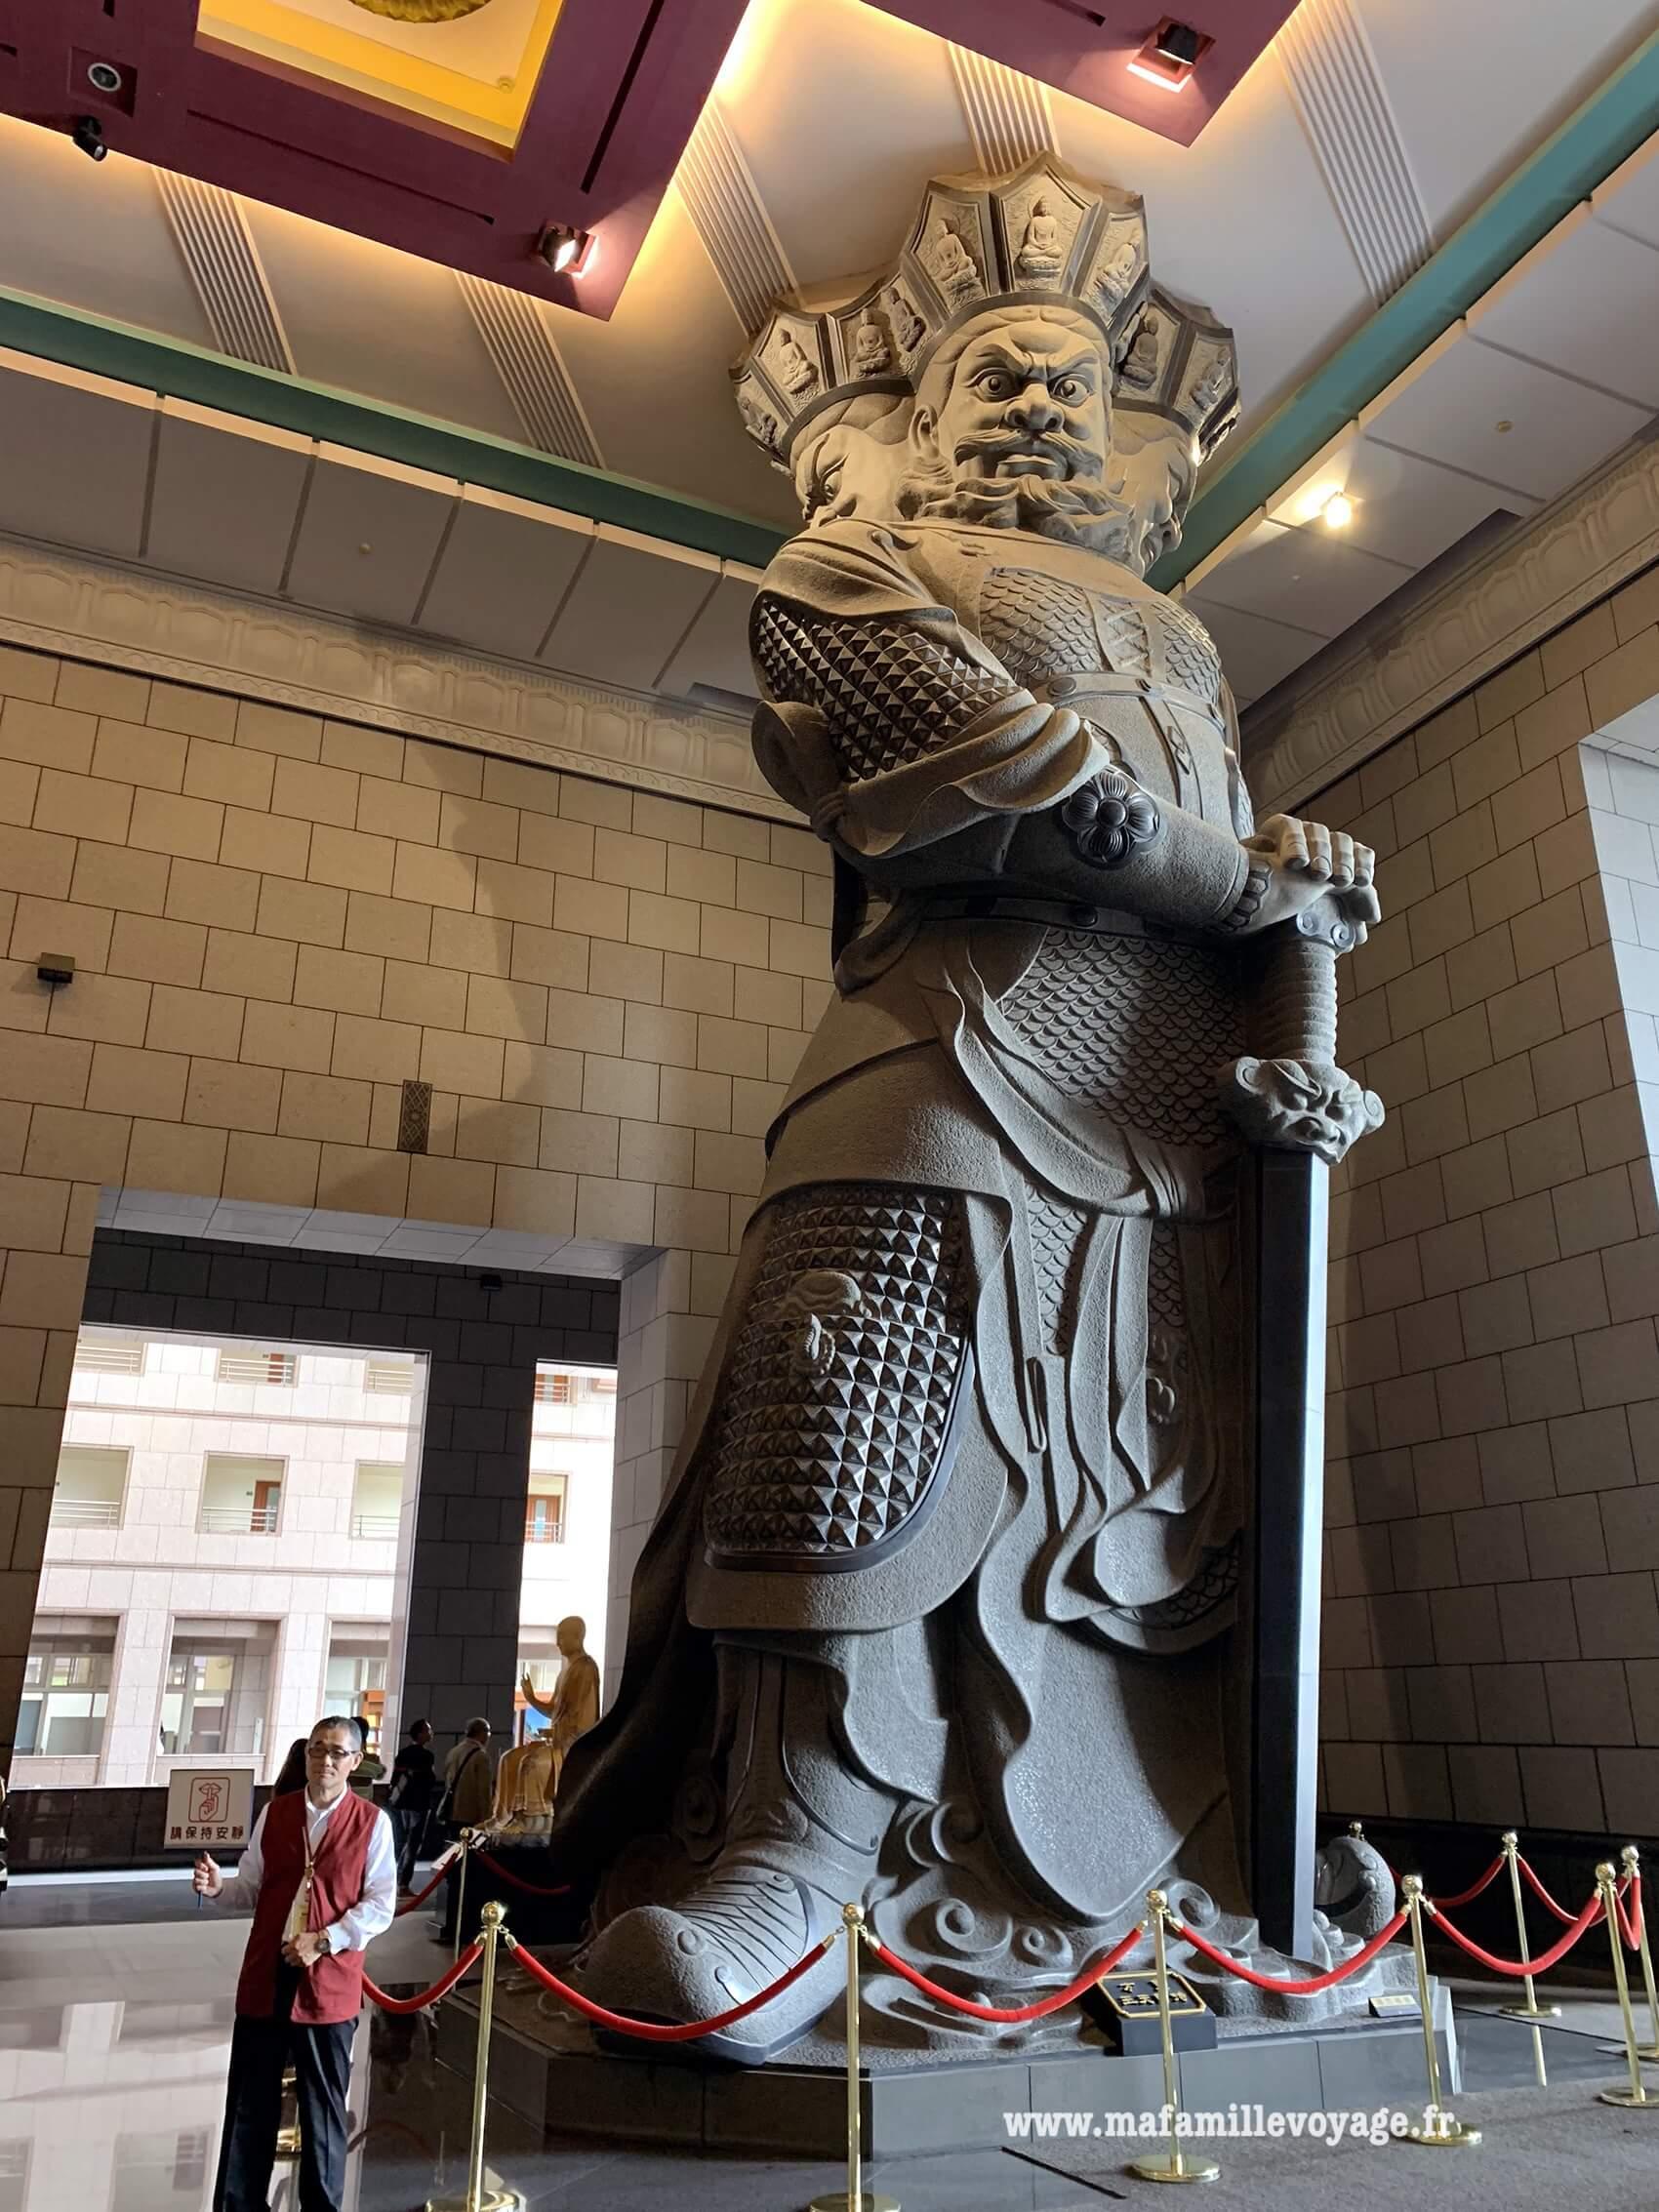 Enorme statue !